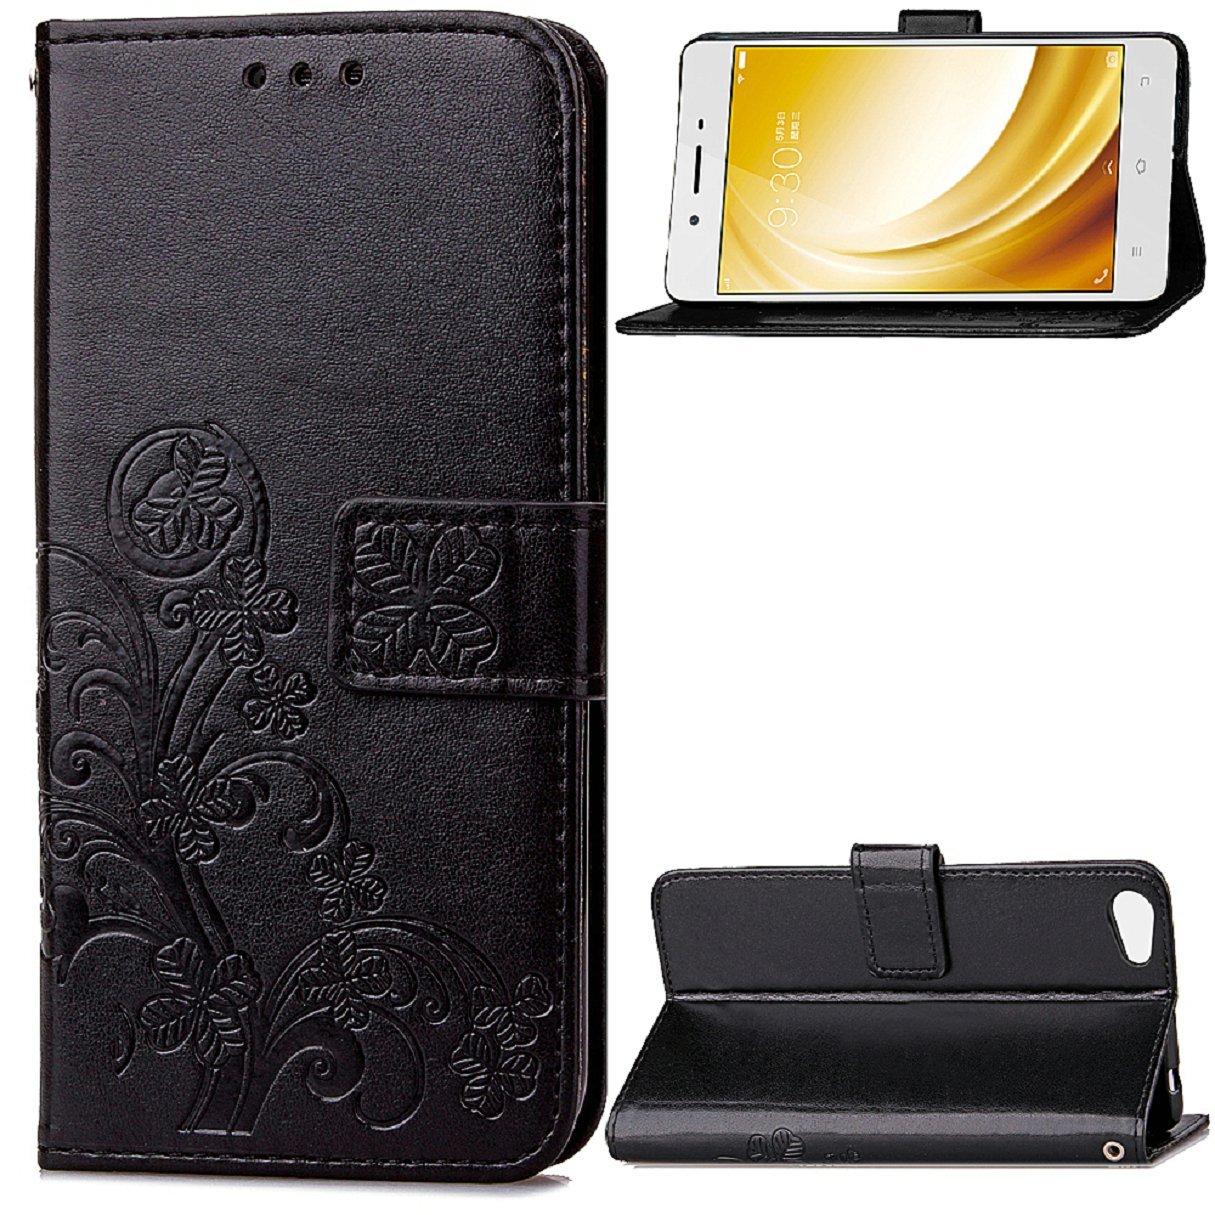 vivo Y53 case,SandWallet,Card slot,Support Case for: Amazon